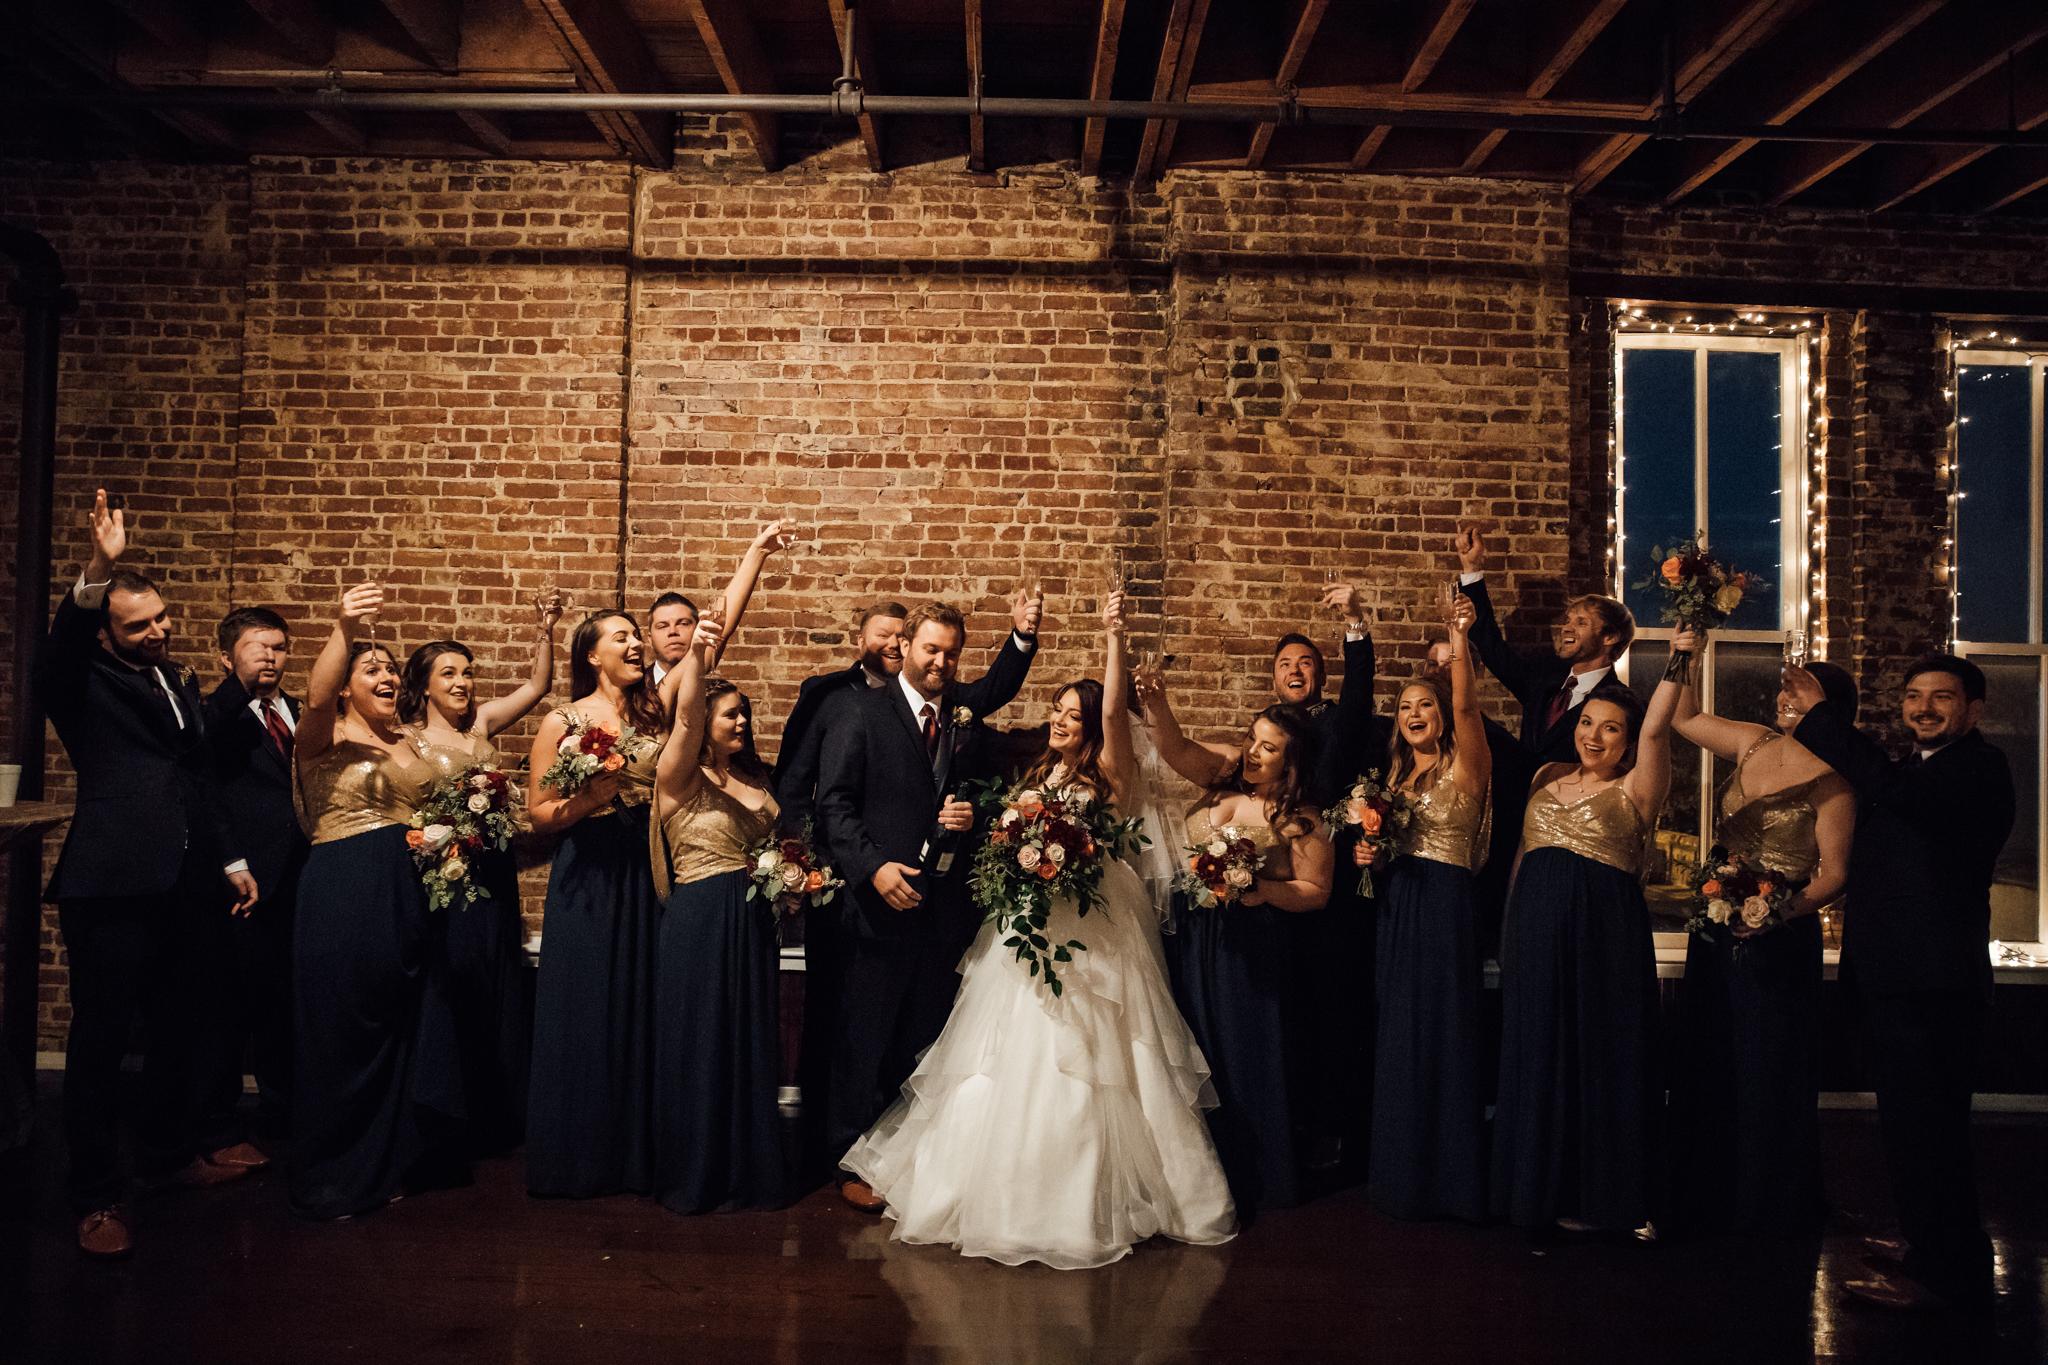 memphis-wedding-photographers-thewarmtharoundyou-ballinese-ballroom (106 of 232).jpg